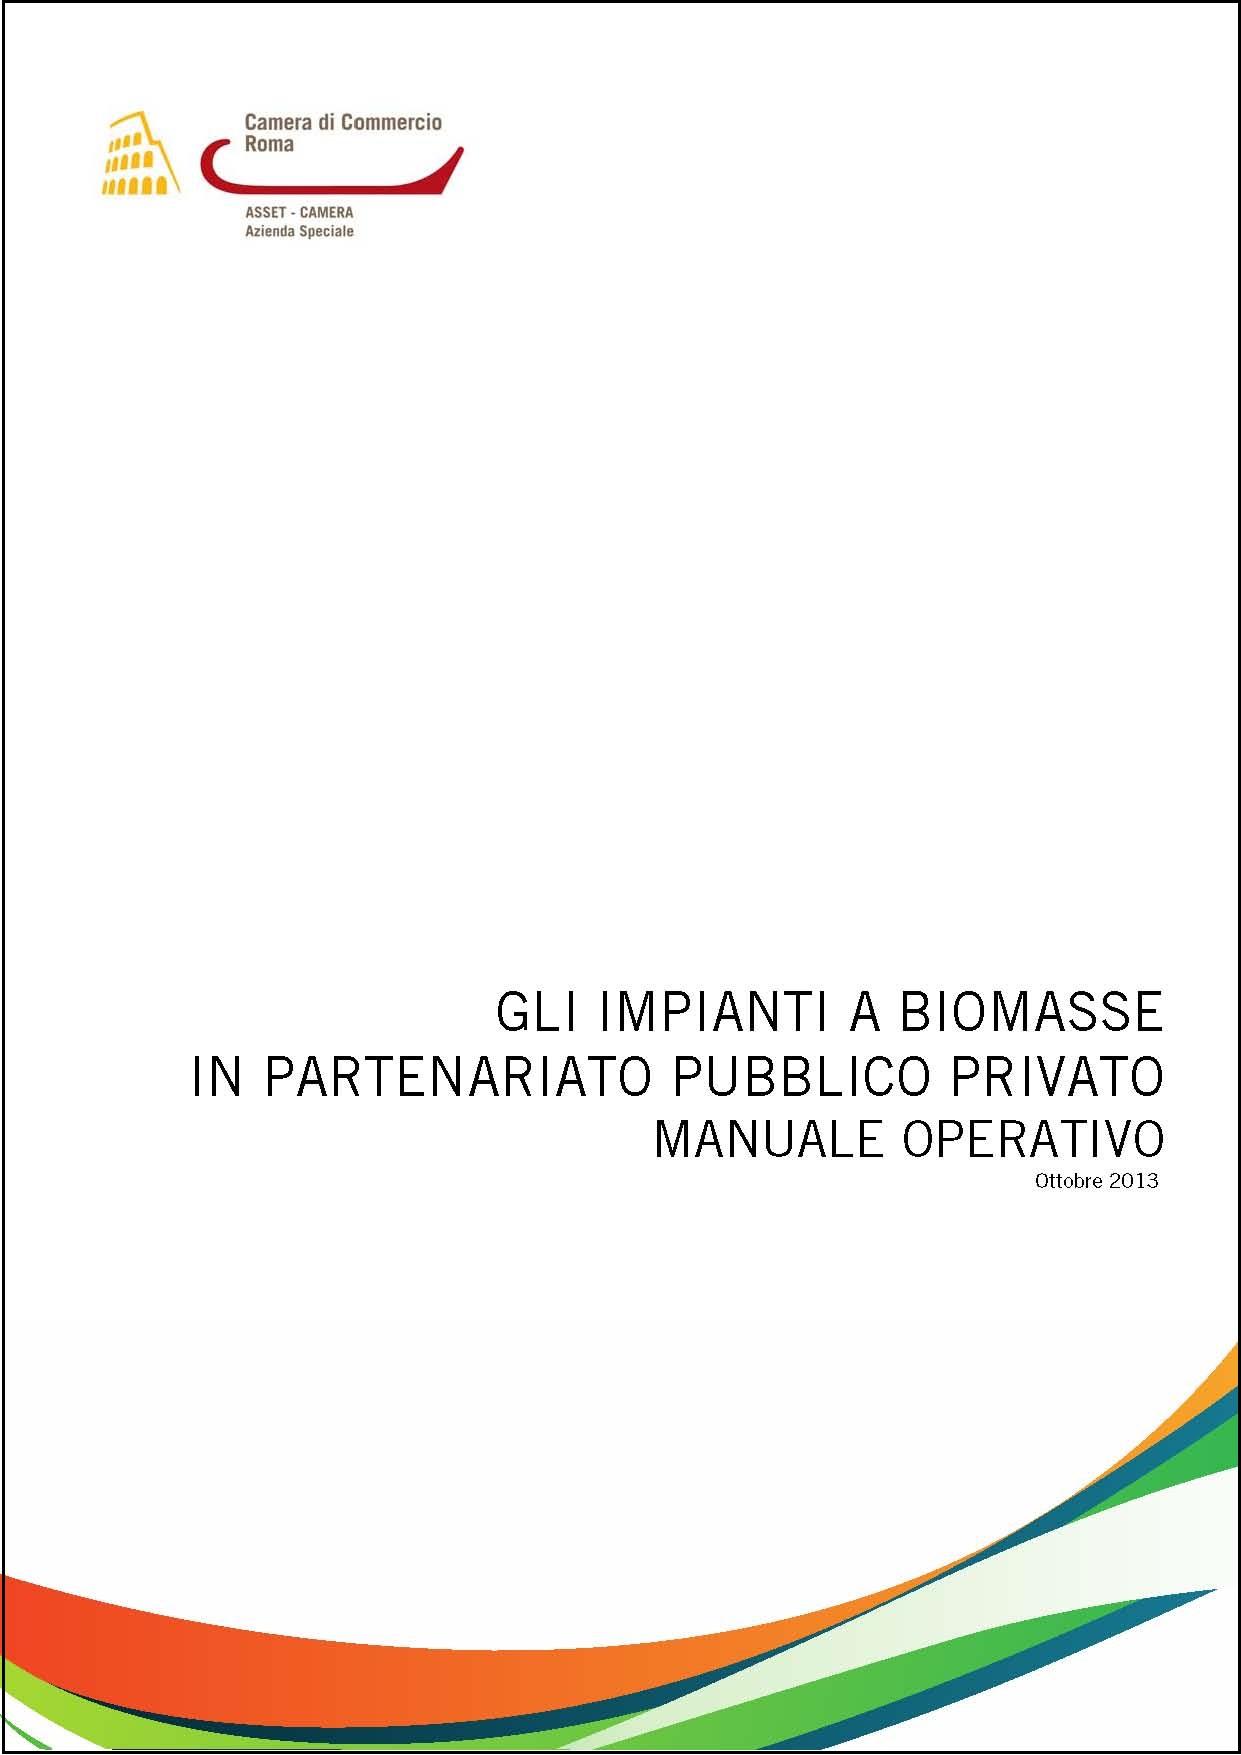 copertina manuale PPP Biomasse